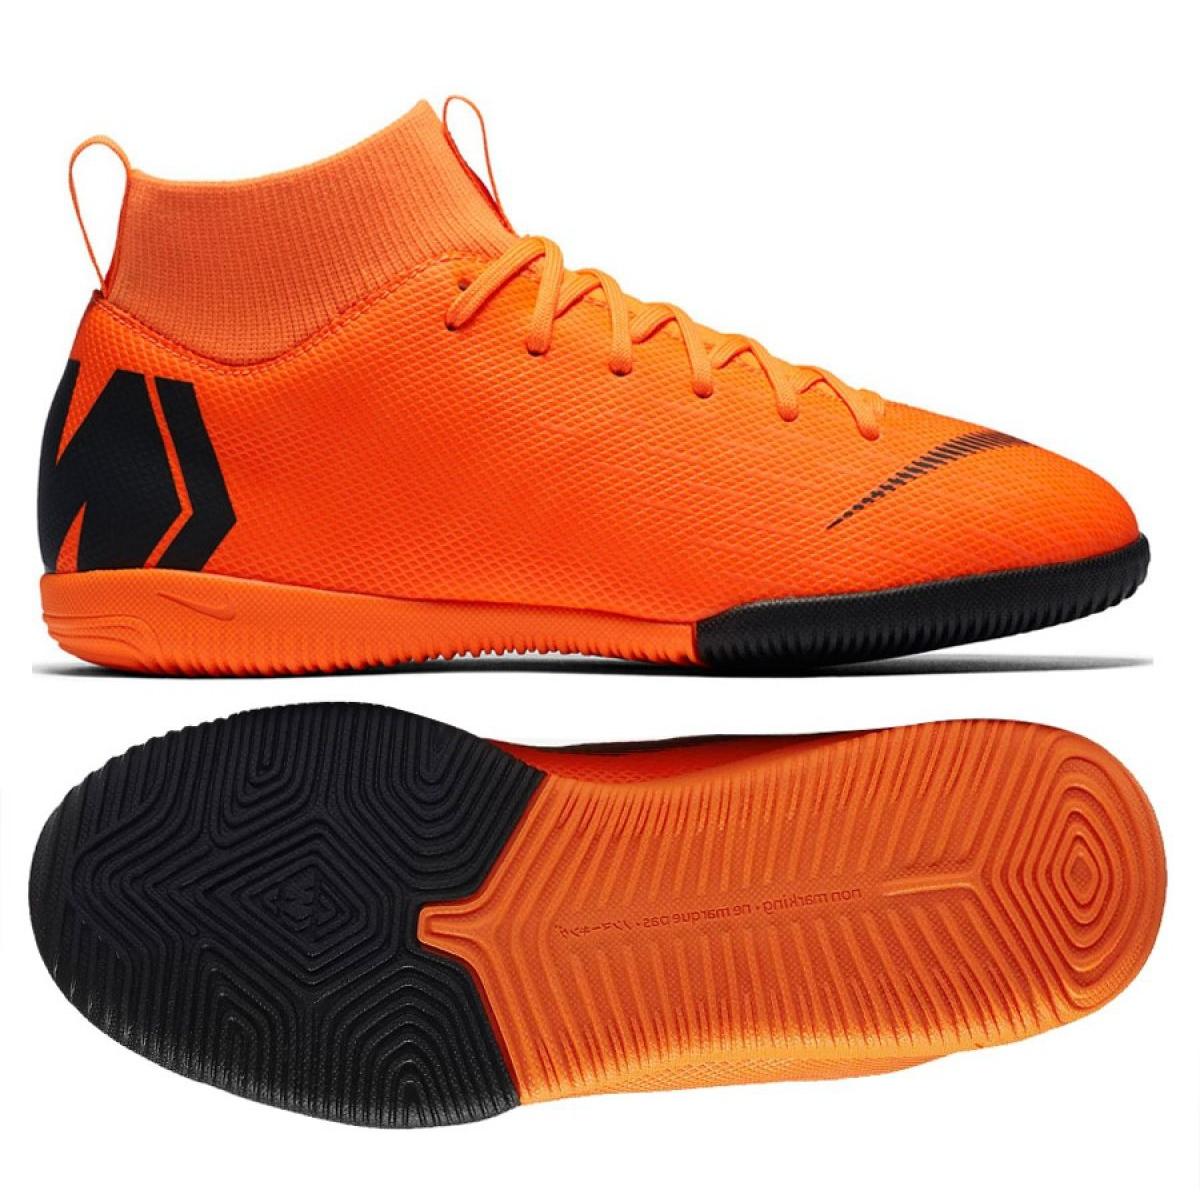 quality design 75c11 69662 Nike Mercurial SuperflyX 6 Academy Gs Ic Jr AH7343-810